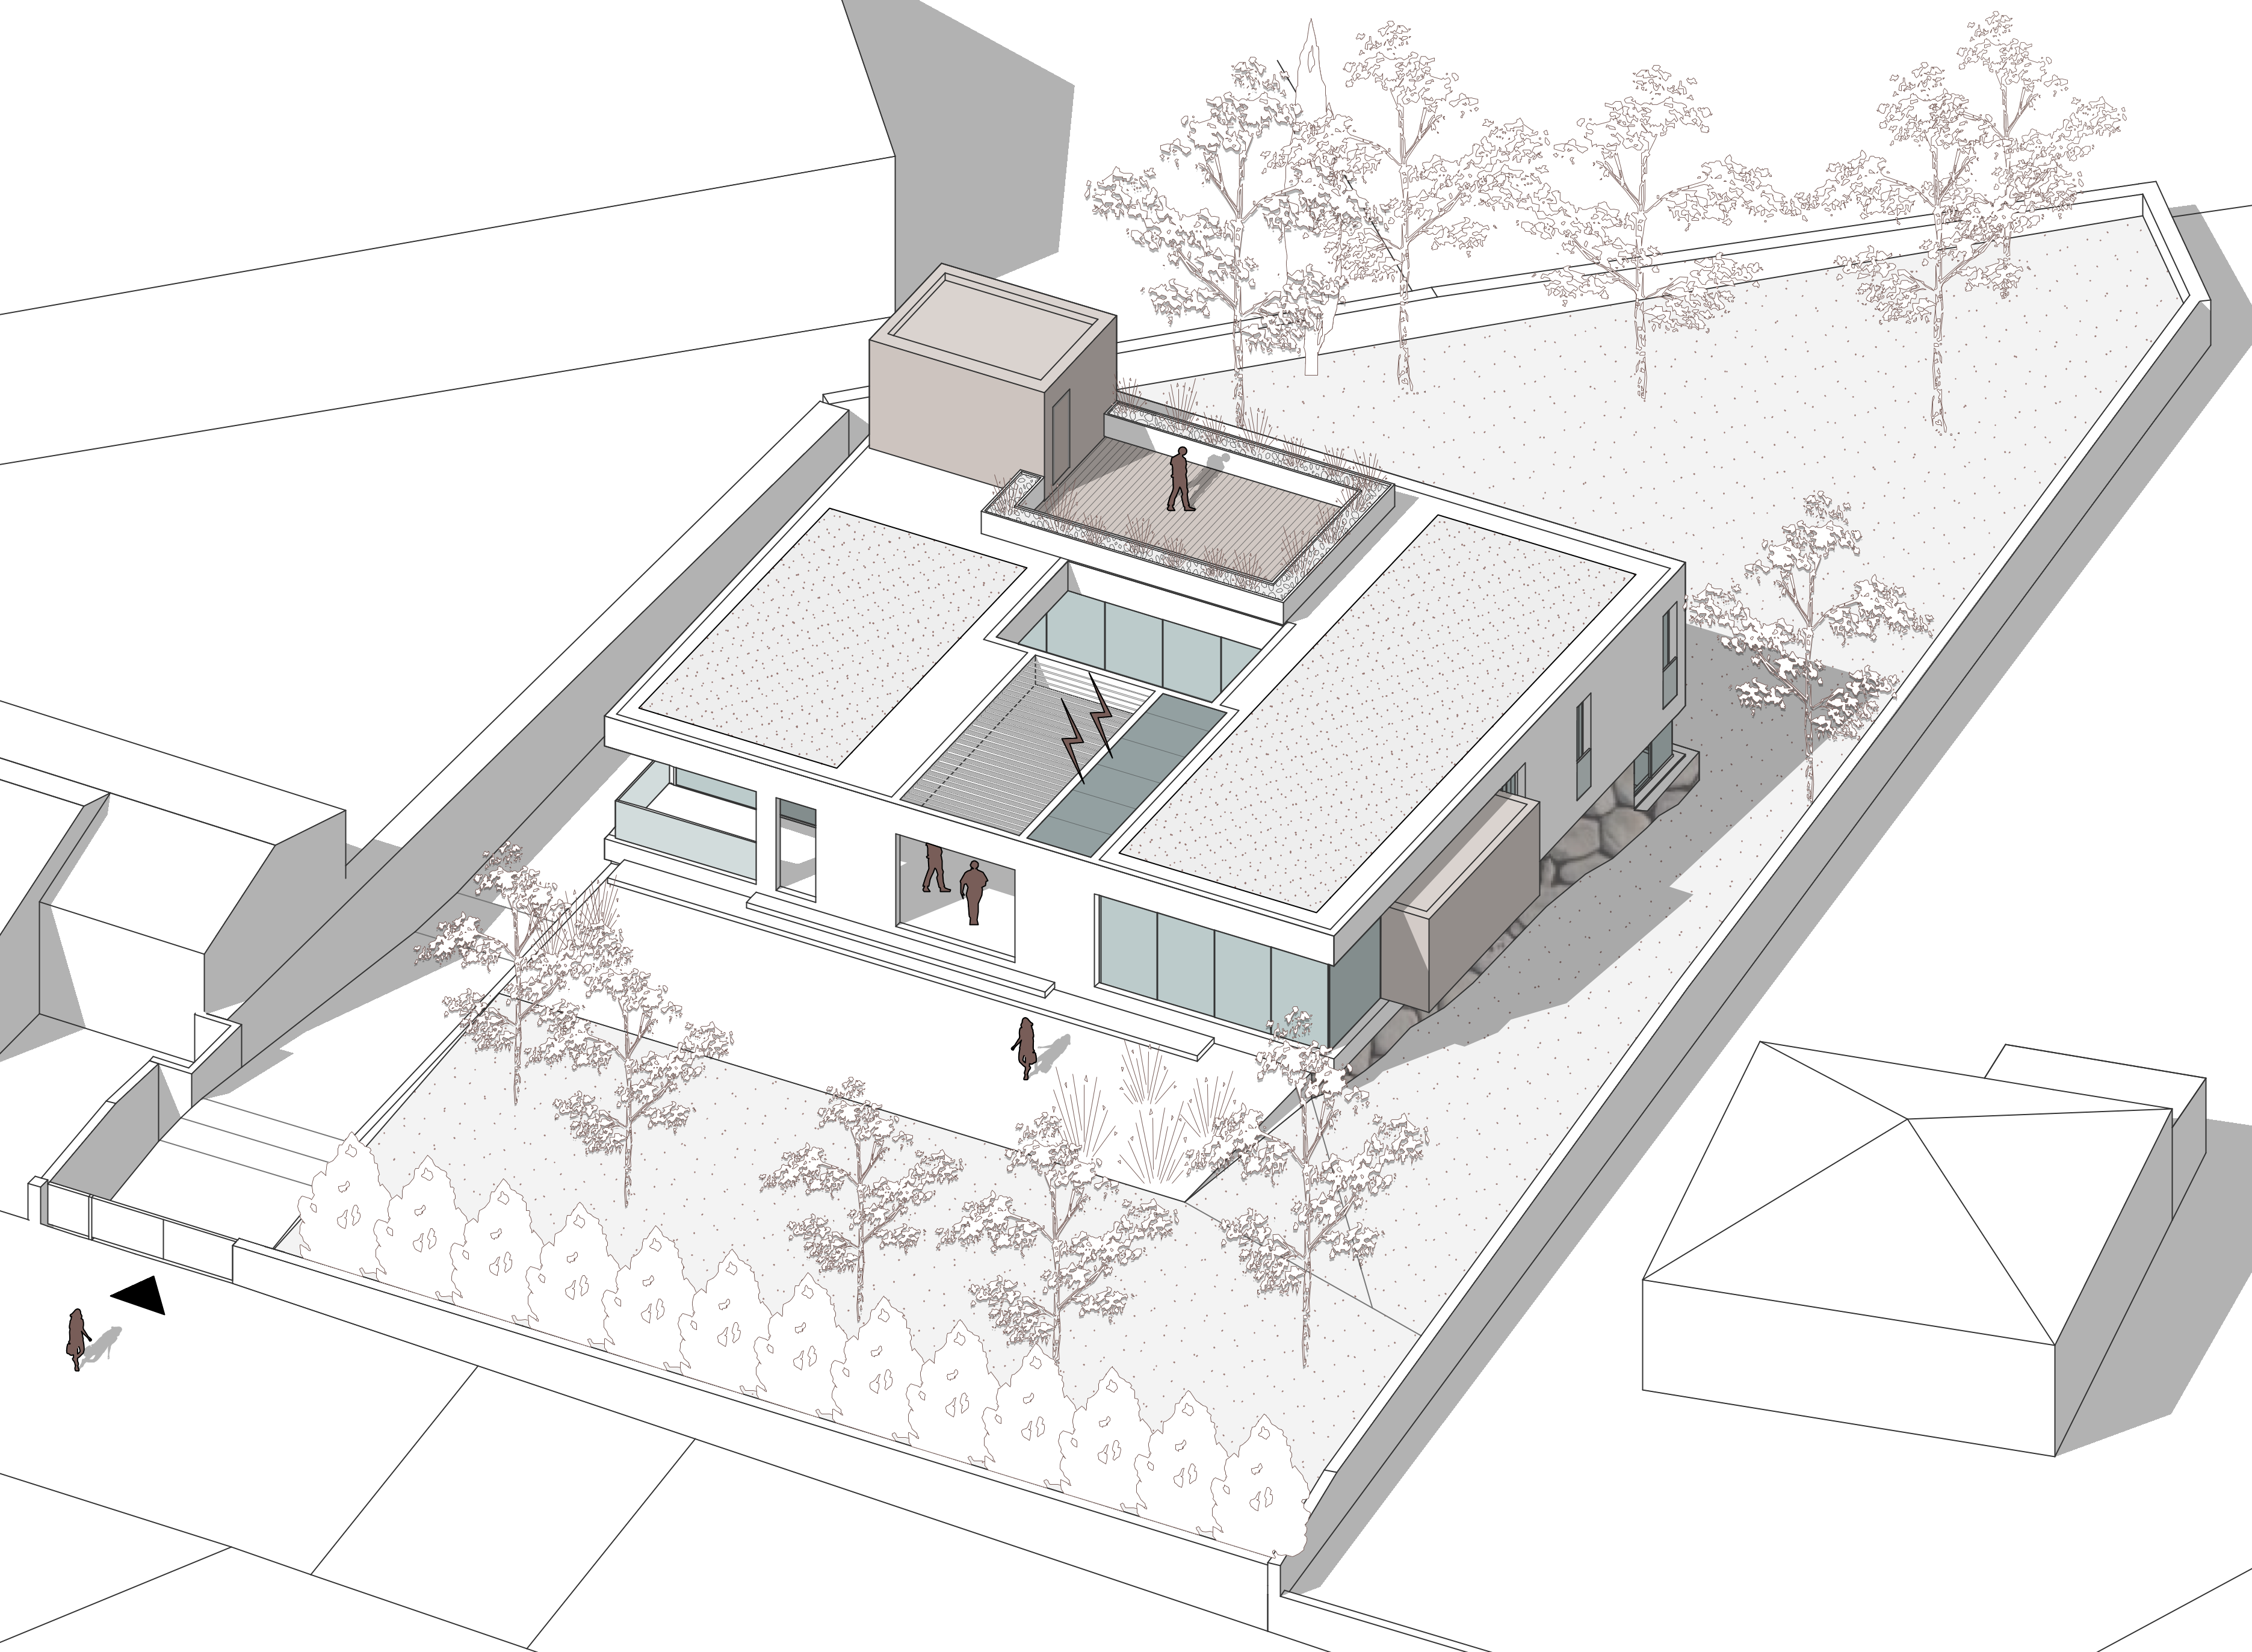 christophe-benichou-architectures-teissier-portal-16